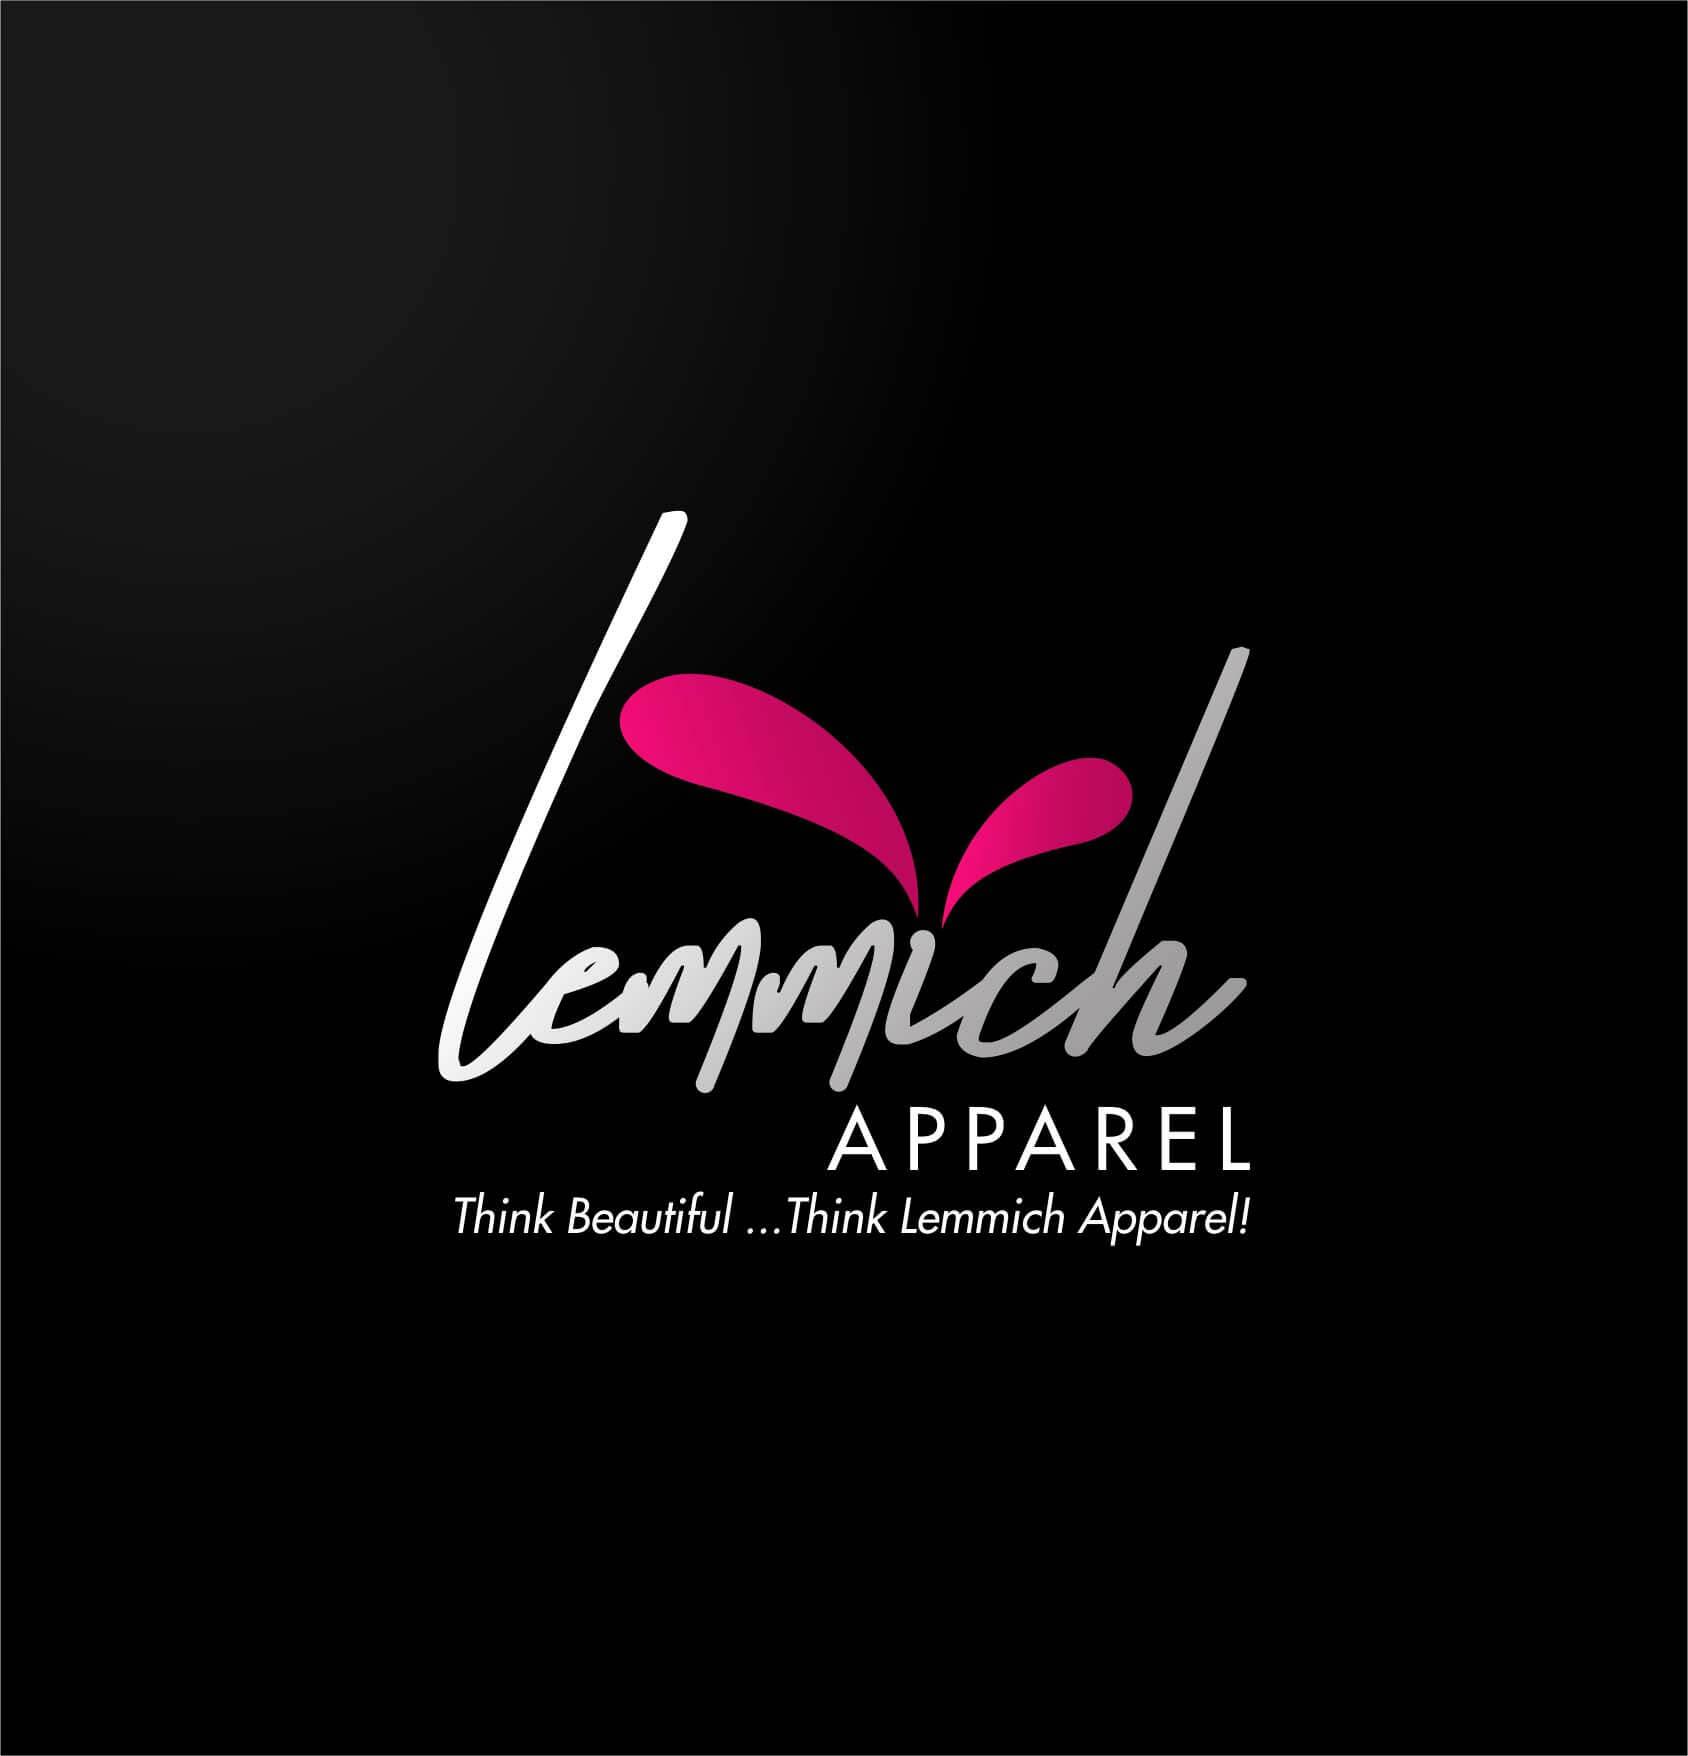 Logo Design For Clothing amp Apparel  Free Online Logo